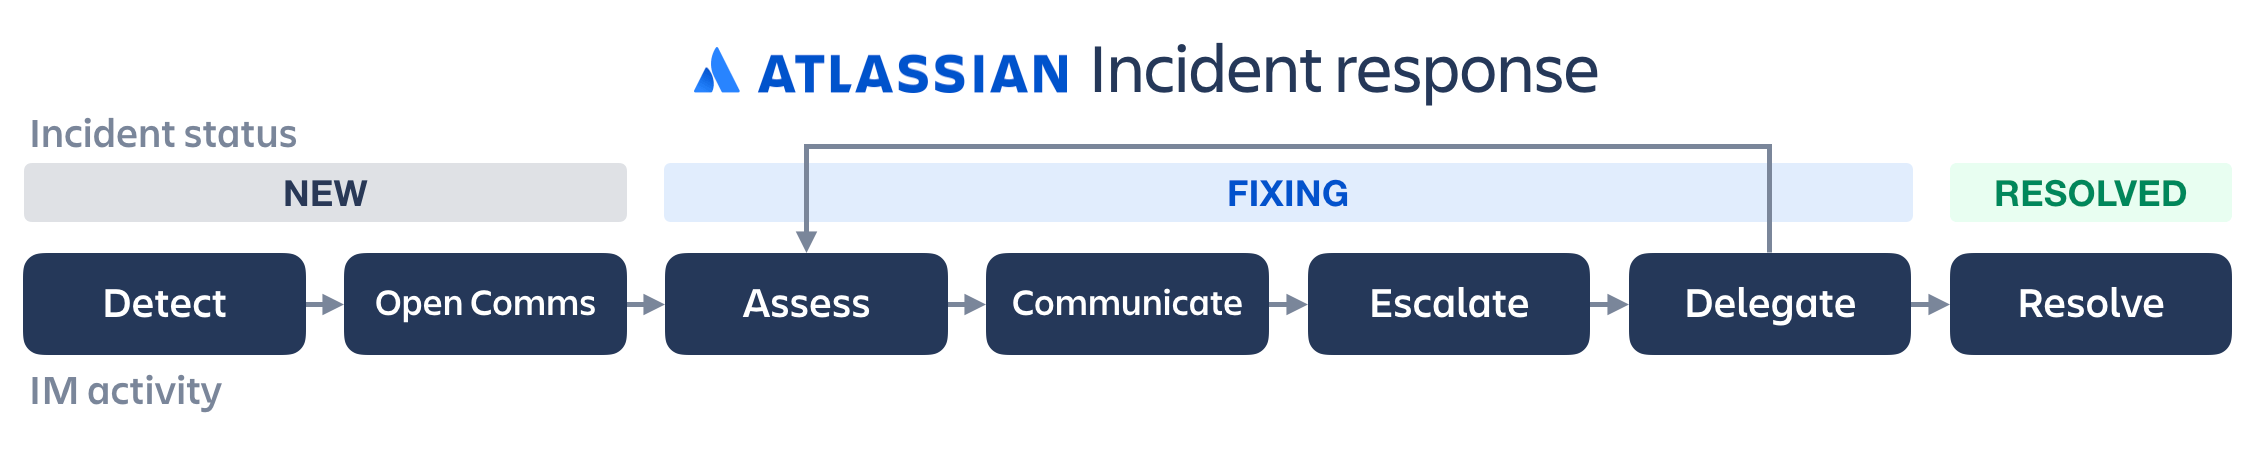 Incident response workflow